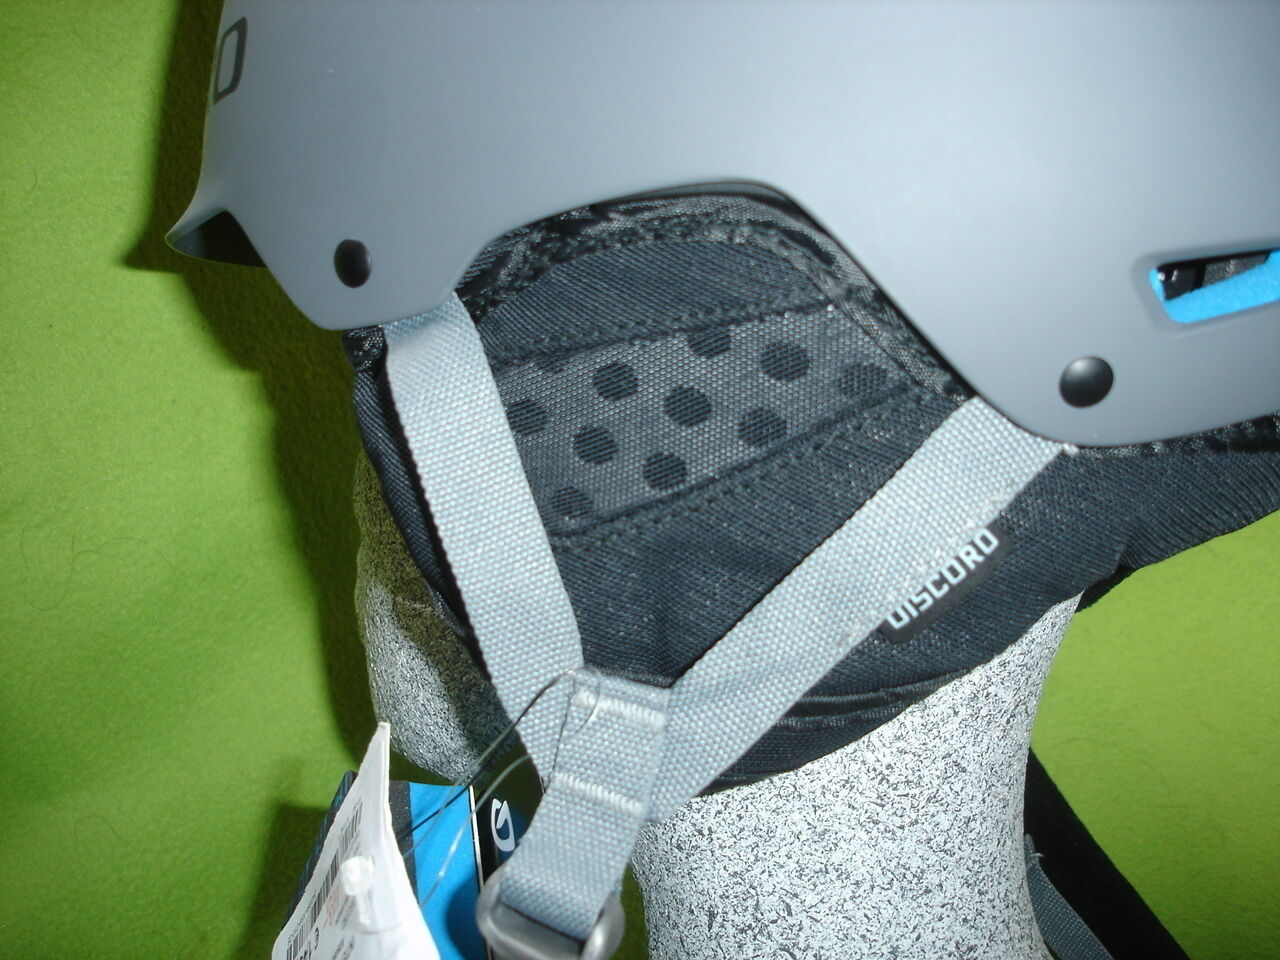 Skihelm Giro Discord Dark shadow matt 52-55 52-55 52-55 5 Softshell Neu Snowboard-Ski-Helm 15dc14